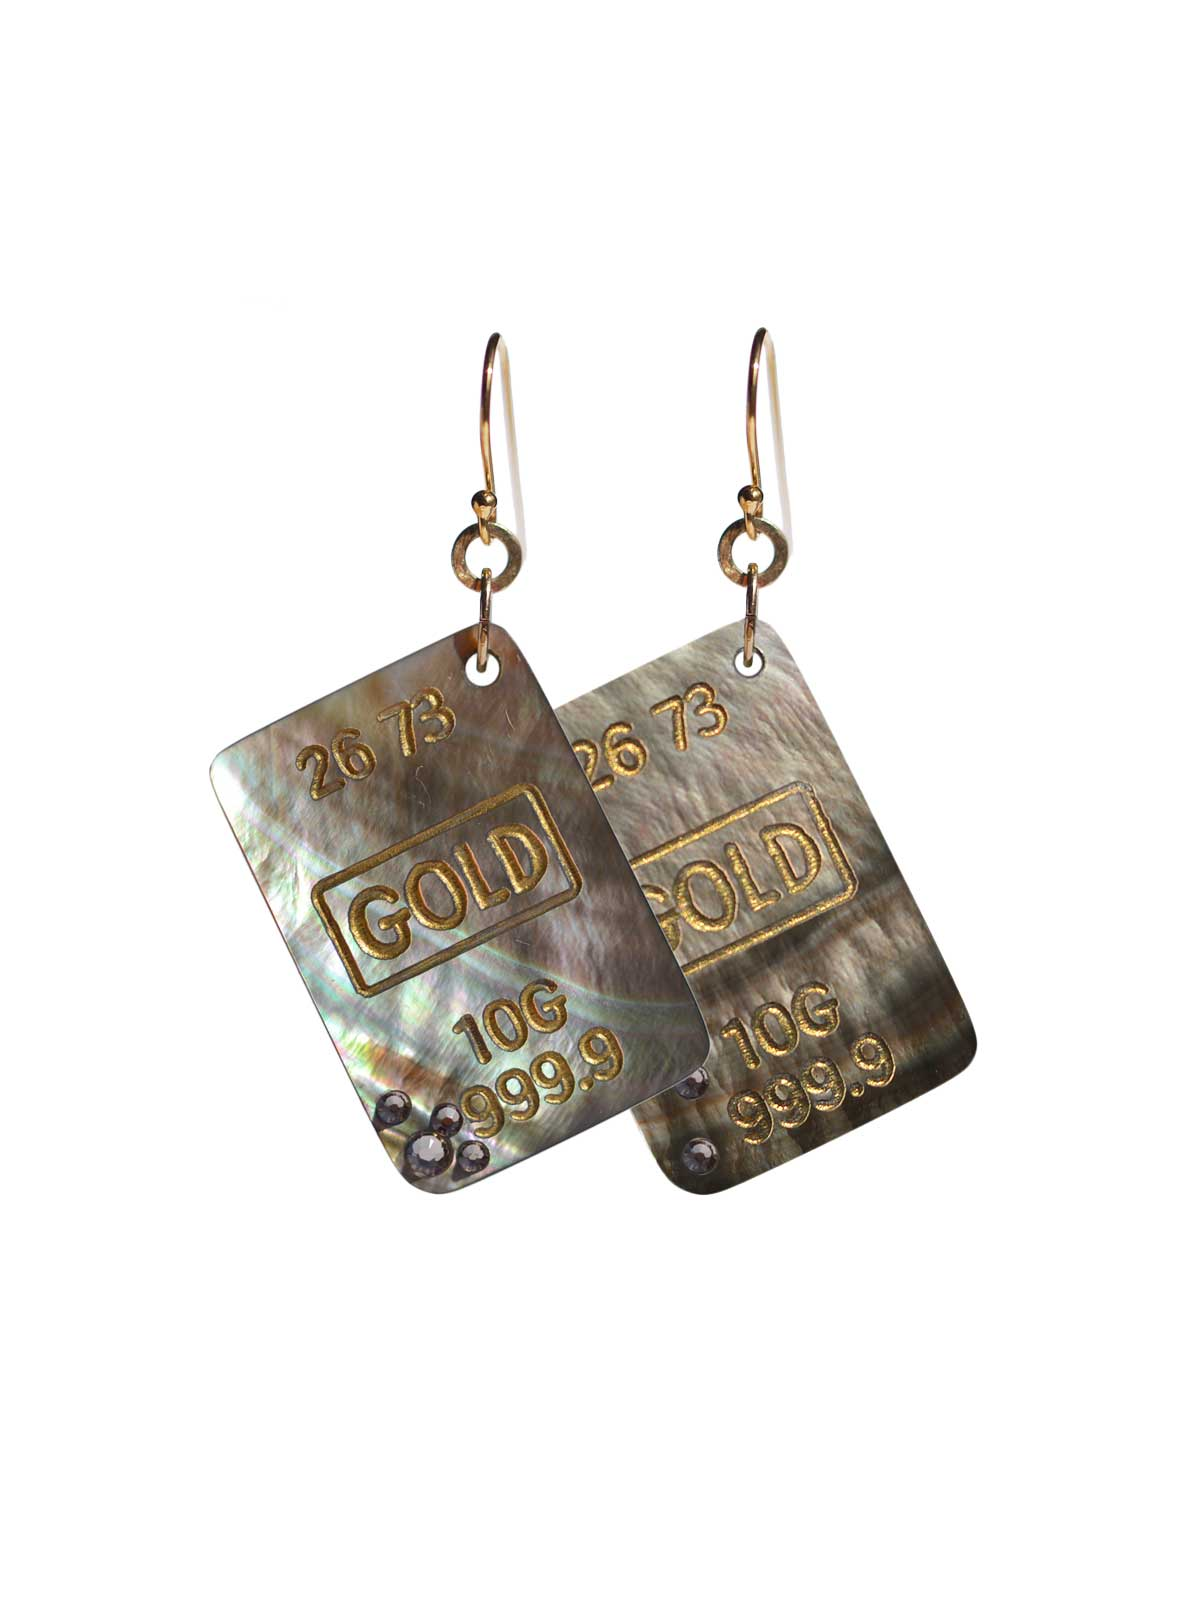 Earrings Gold-filled 14 Karat Mother-of-pearl of Tahiti Swarovski crystal